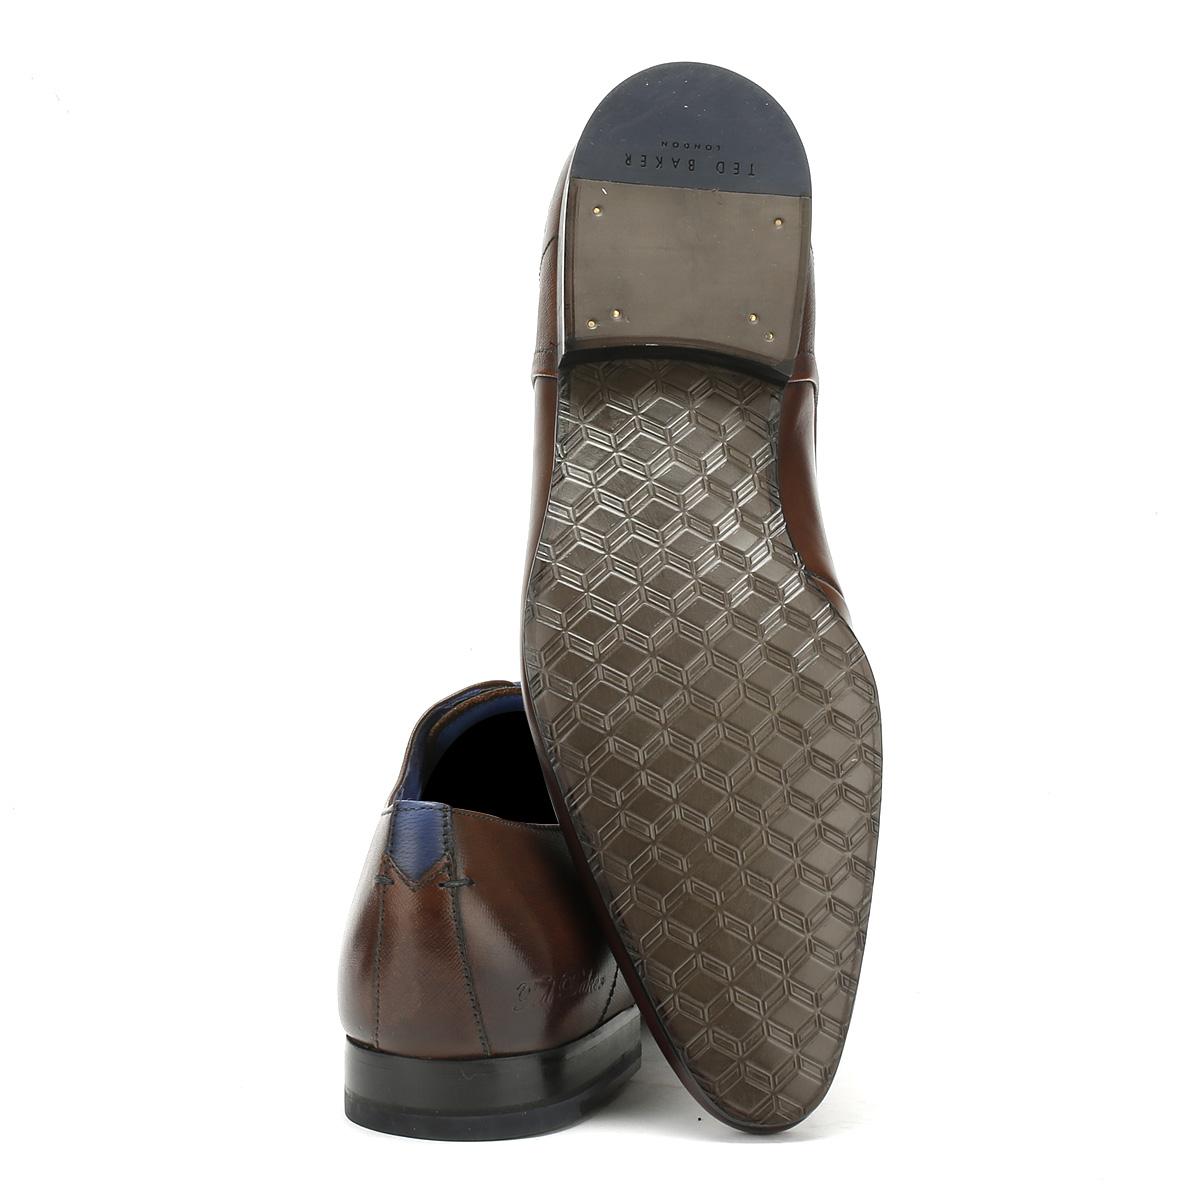 Ted Baker Mens Peair Formal Schuhes Dark Braun Leder Lace Up Smarts